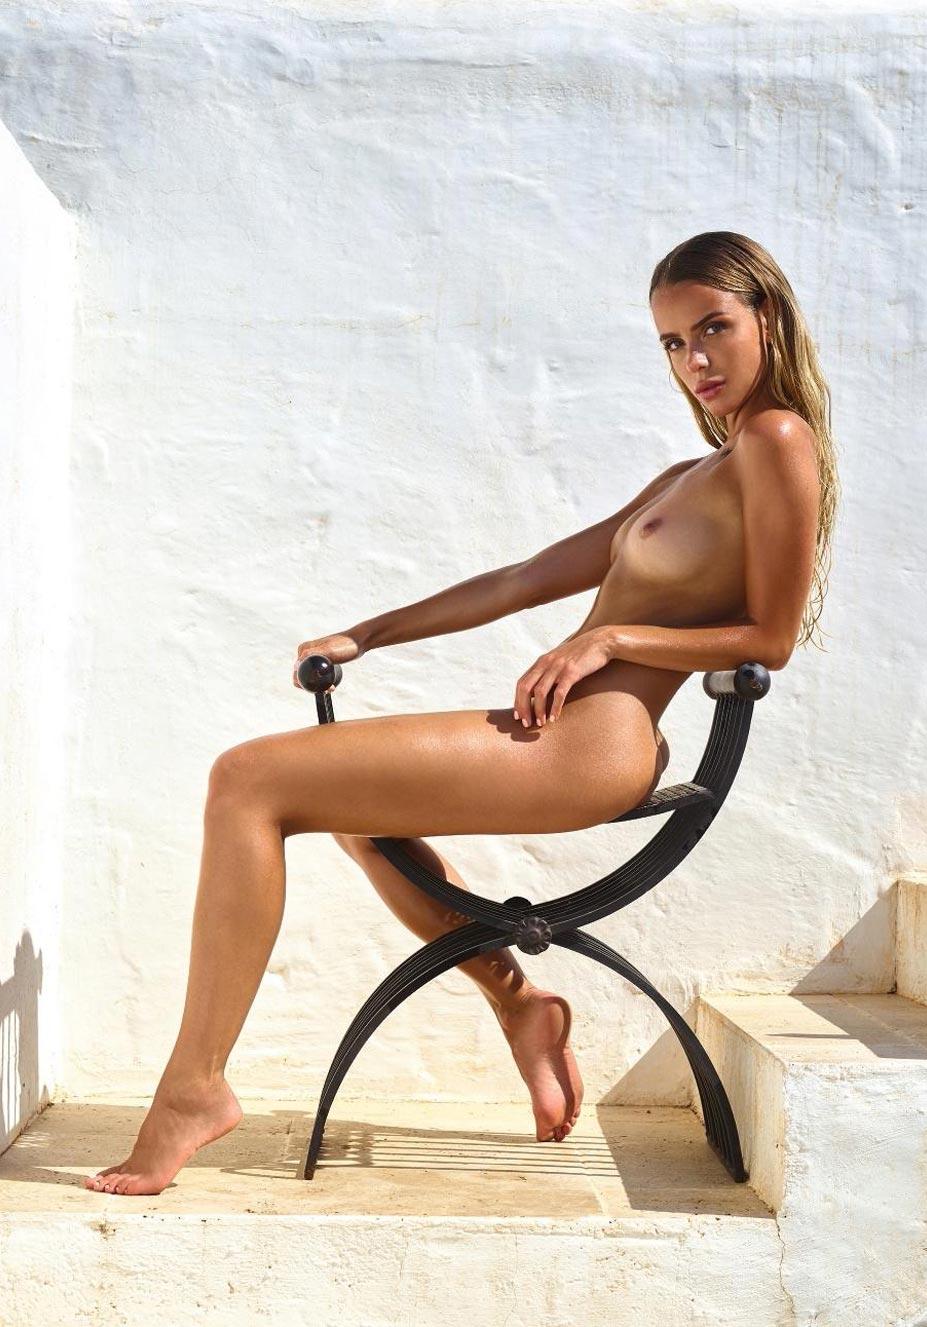 Тэйлор Брюманн - Девушка месяца Playboy Германия в мае 2021 / фото 03